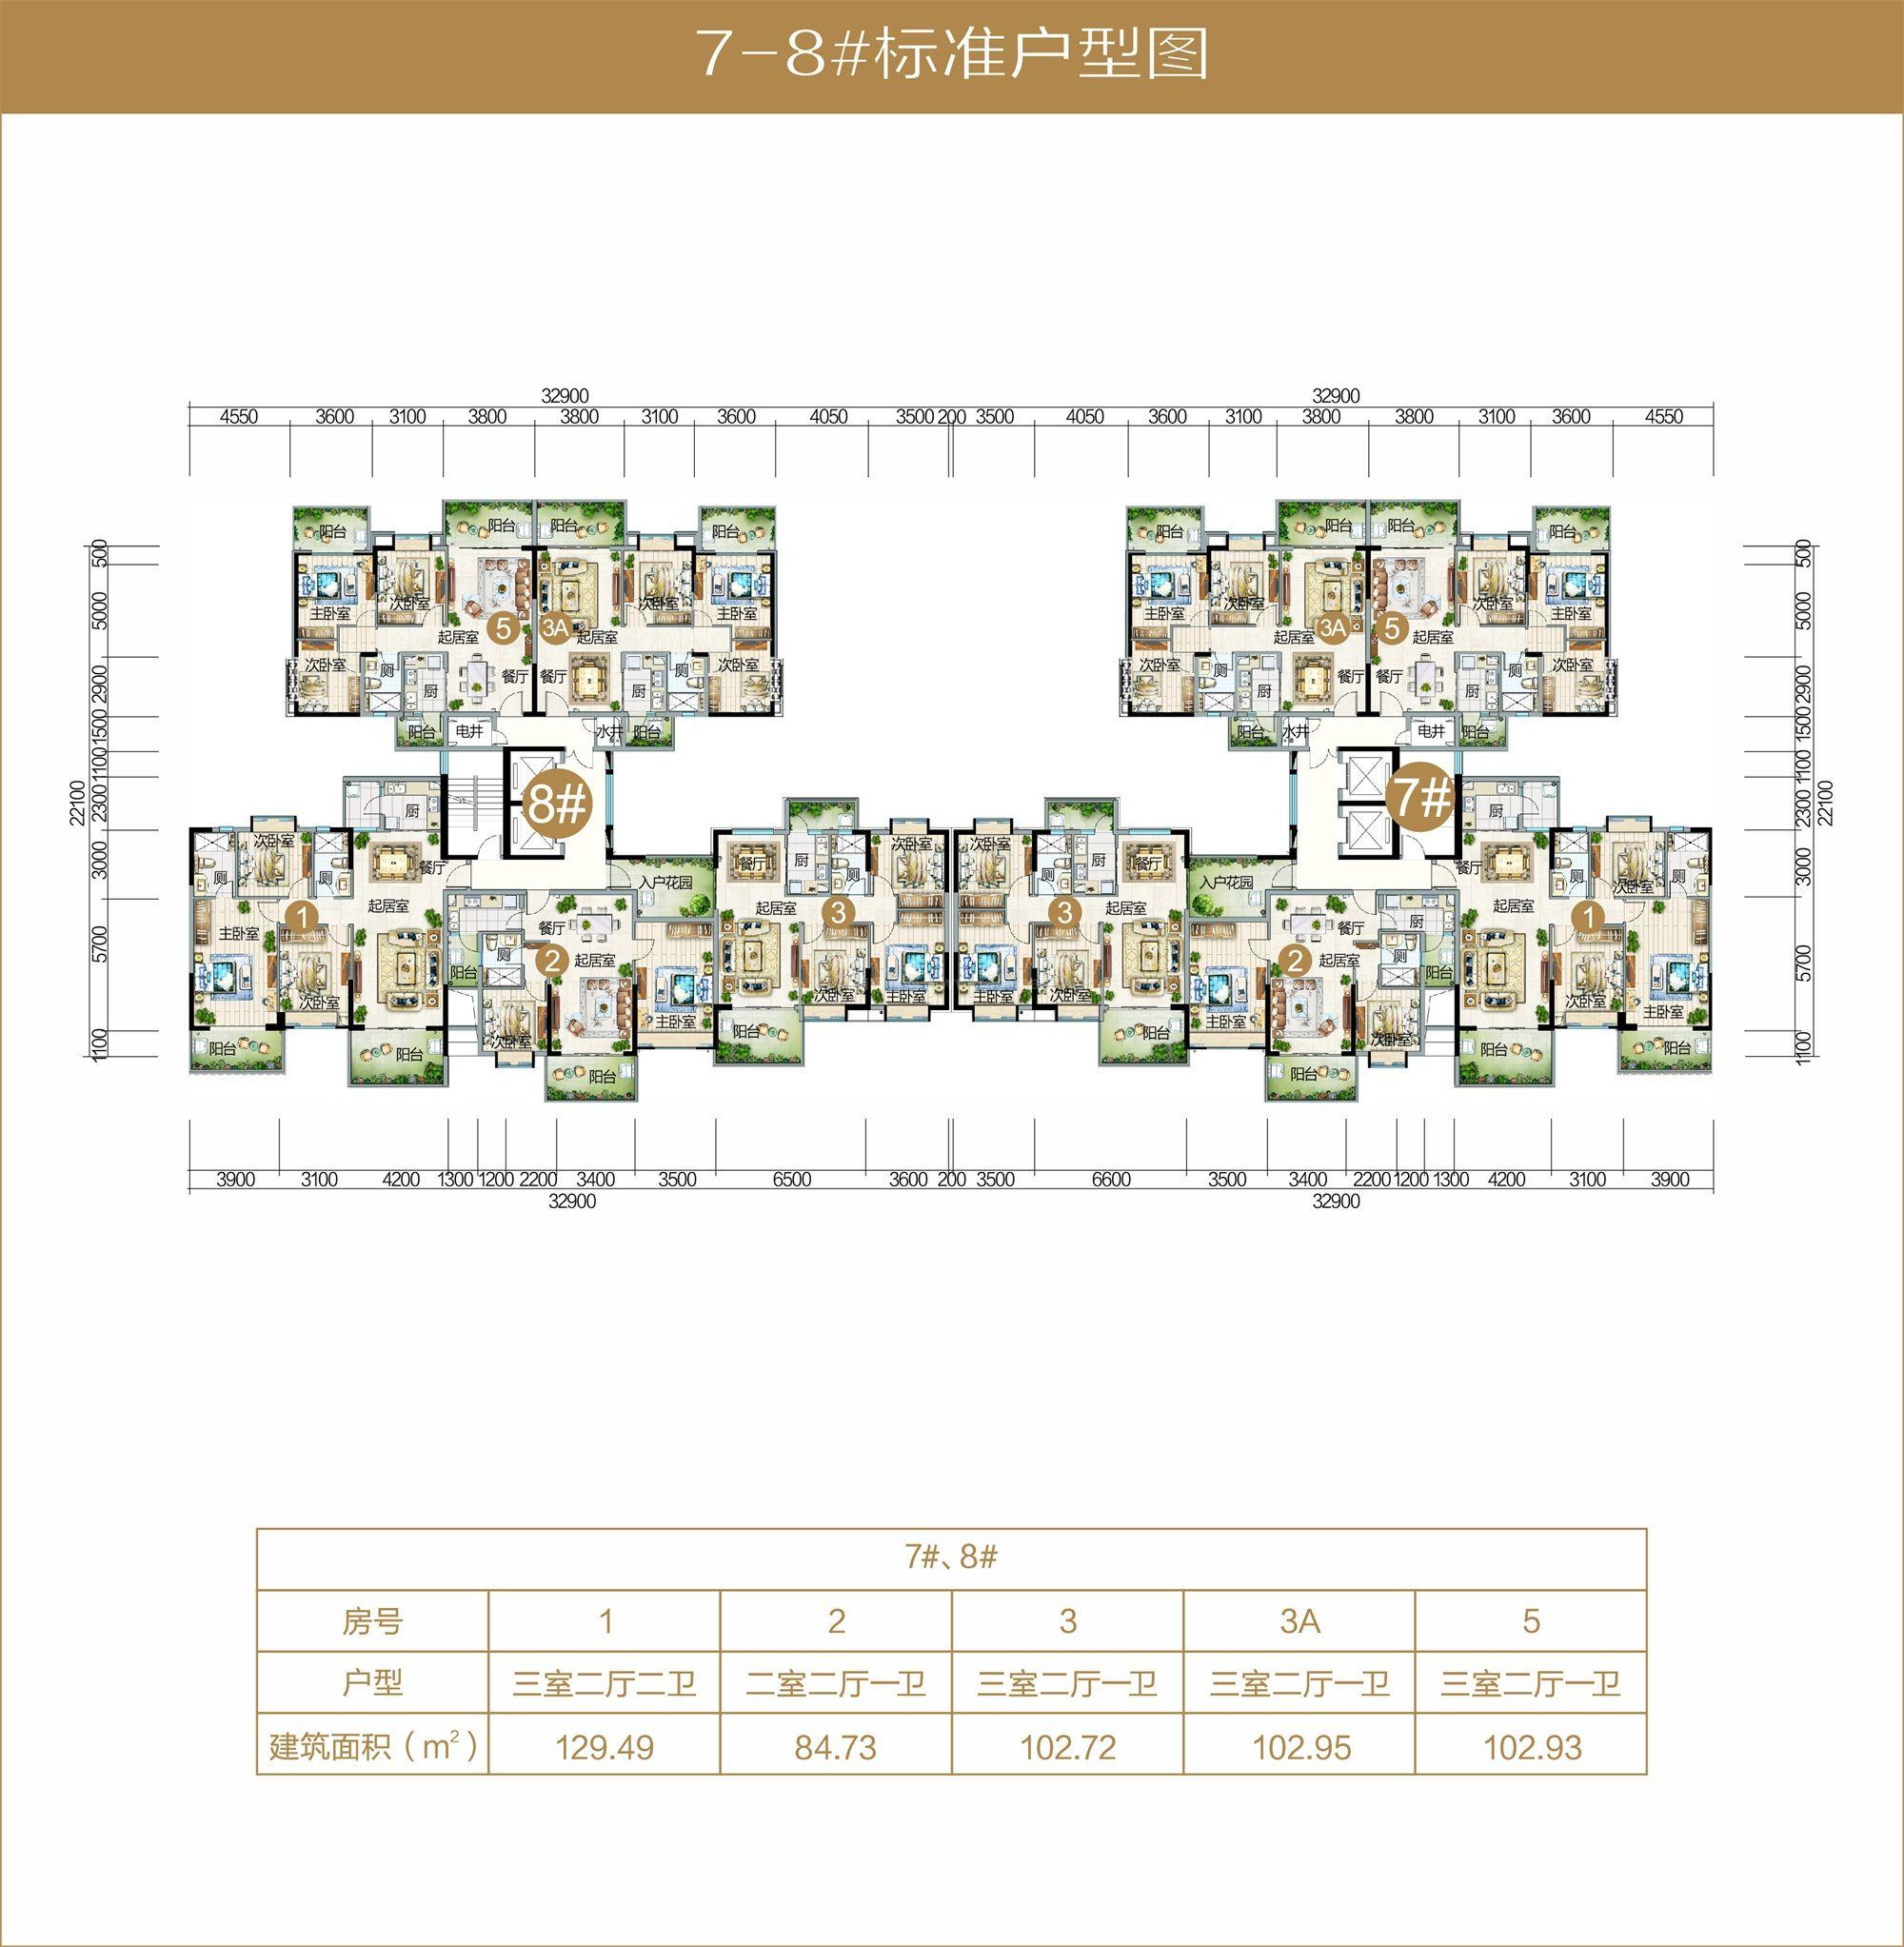 A05区7-8栋标准户型图